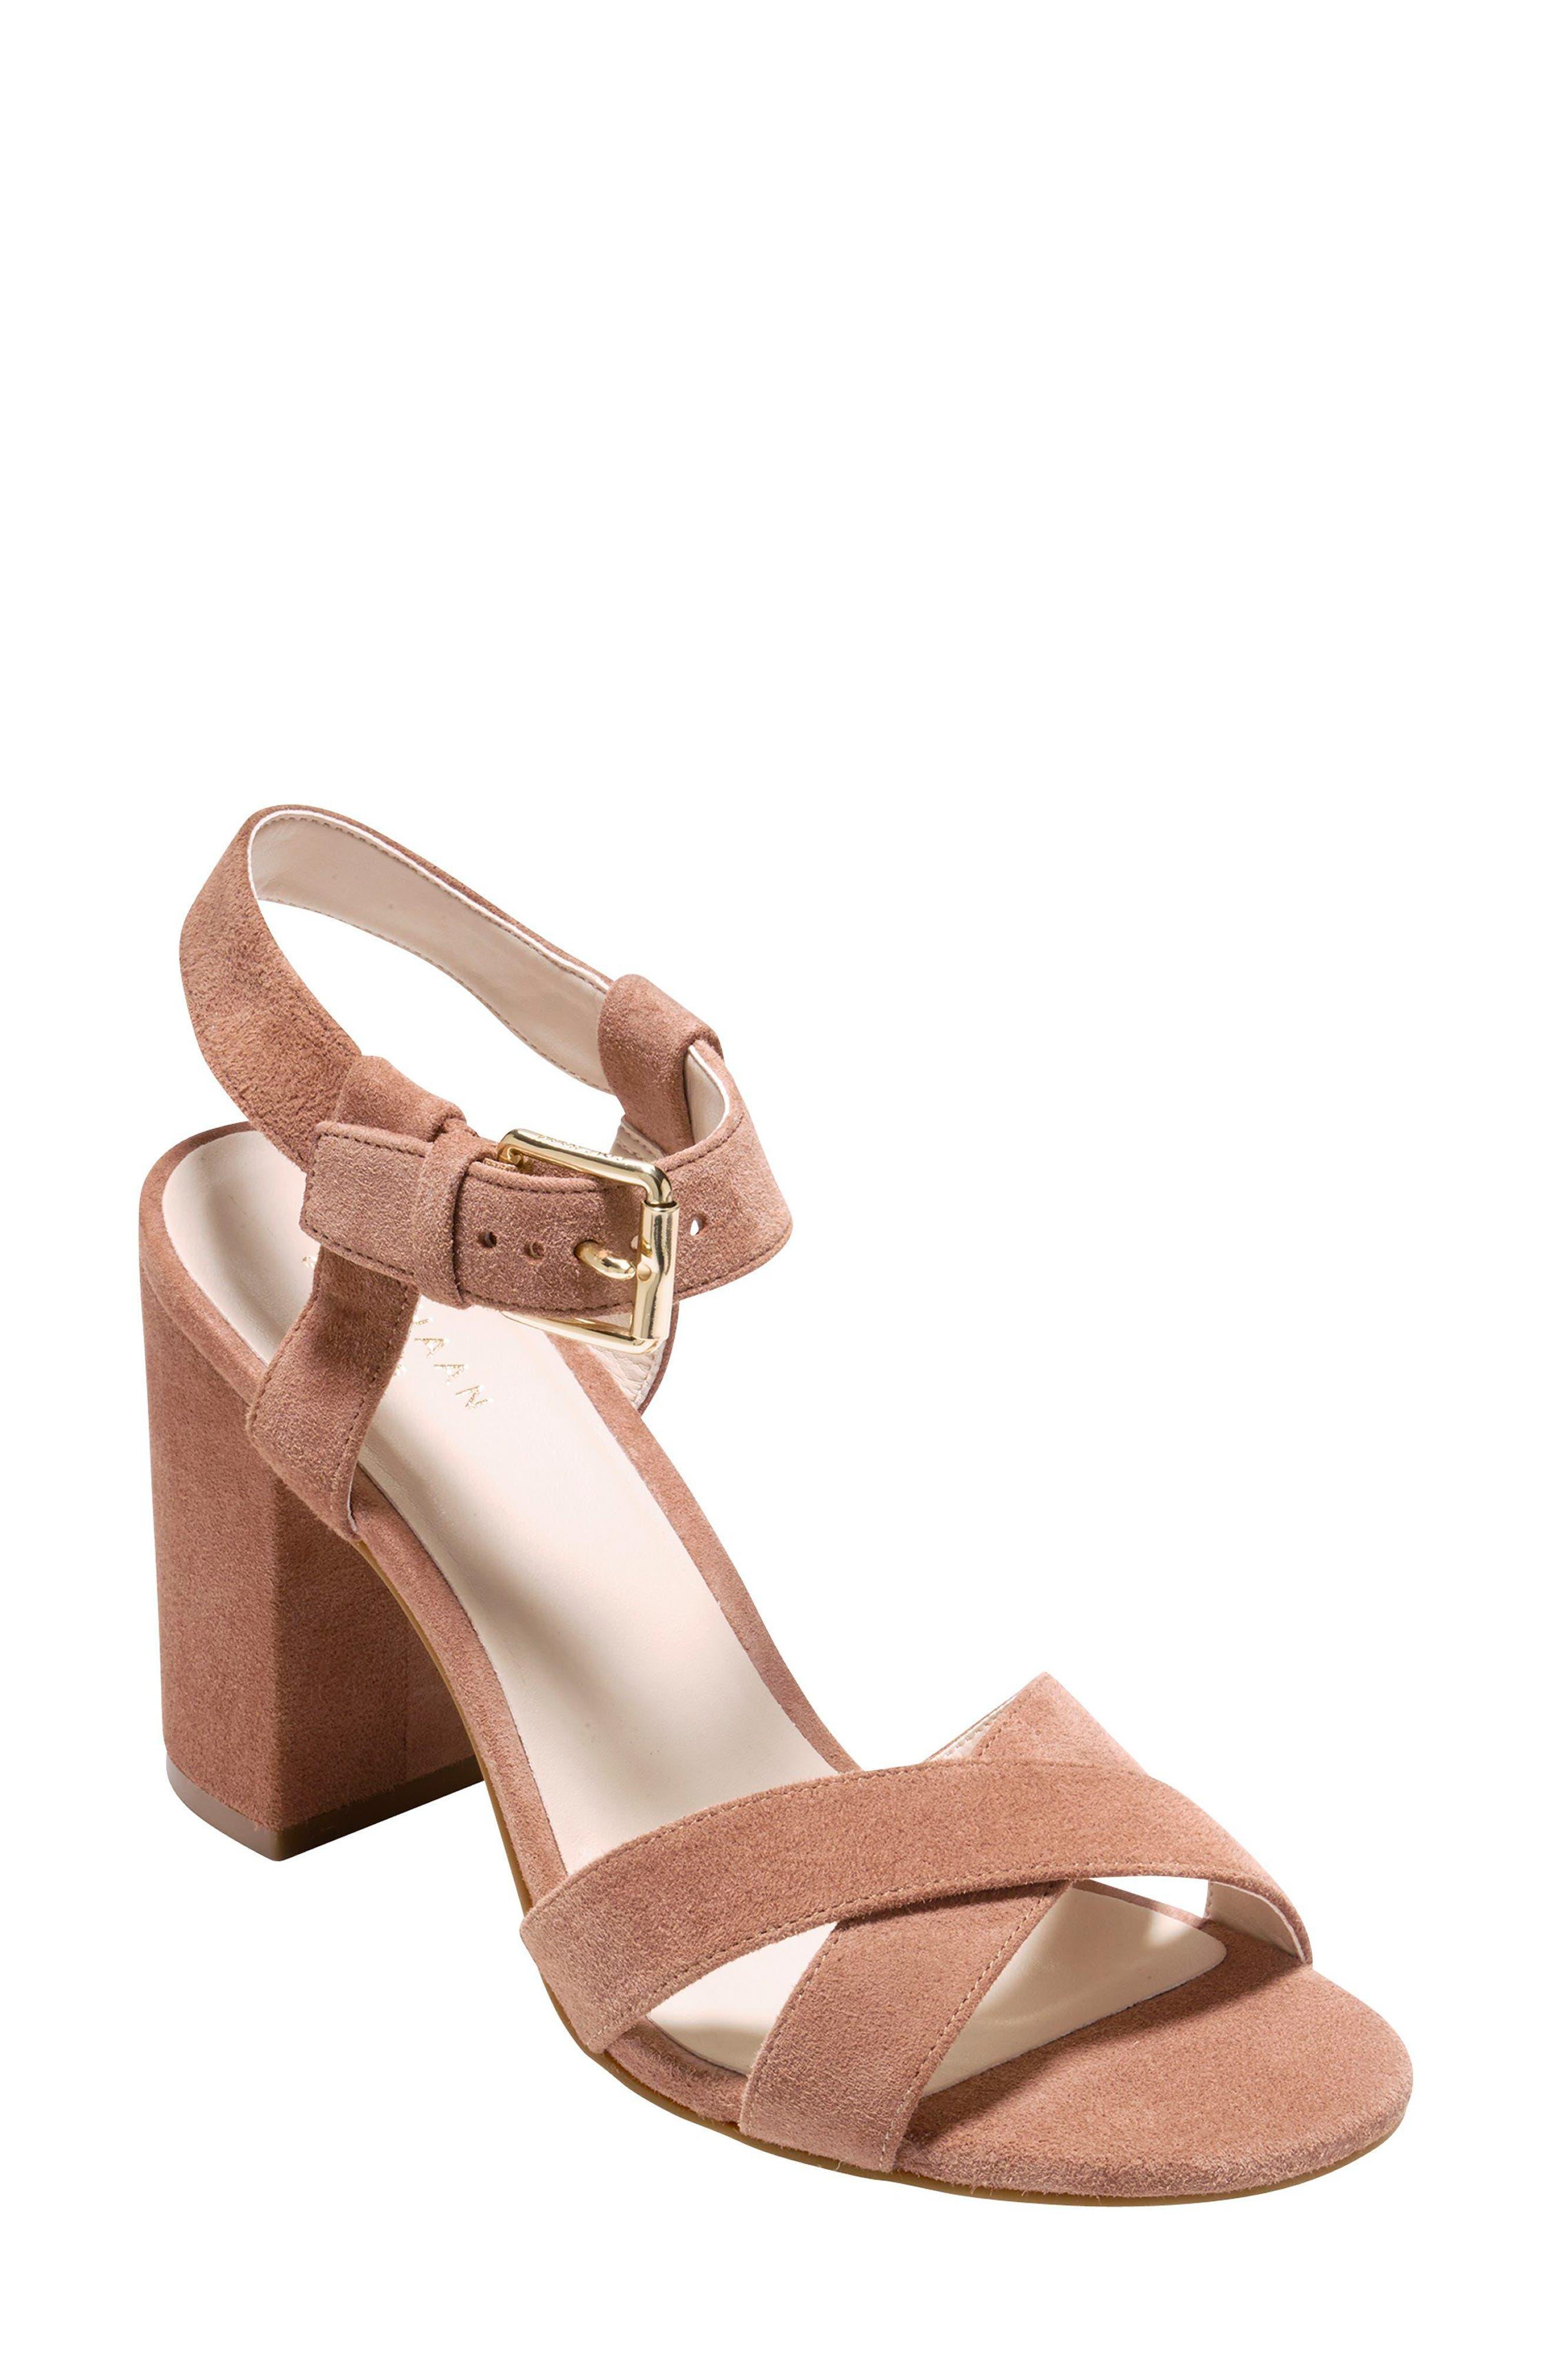 Alternate Image 1 Selected - Cole Haan Kadi Ankle Strap Sandal (Women)